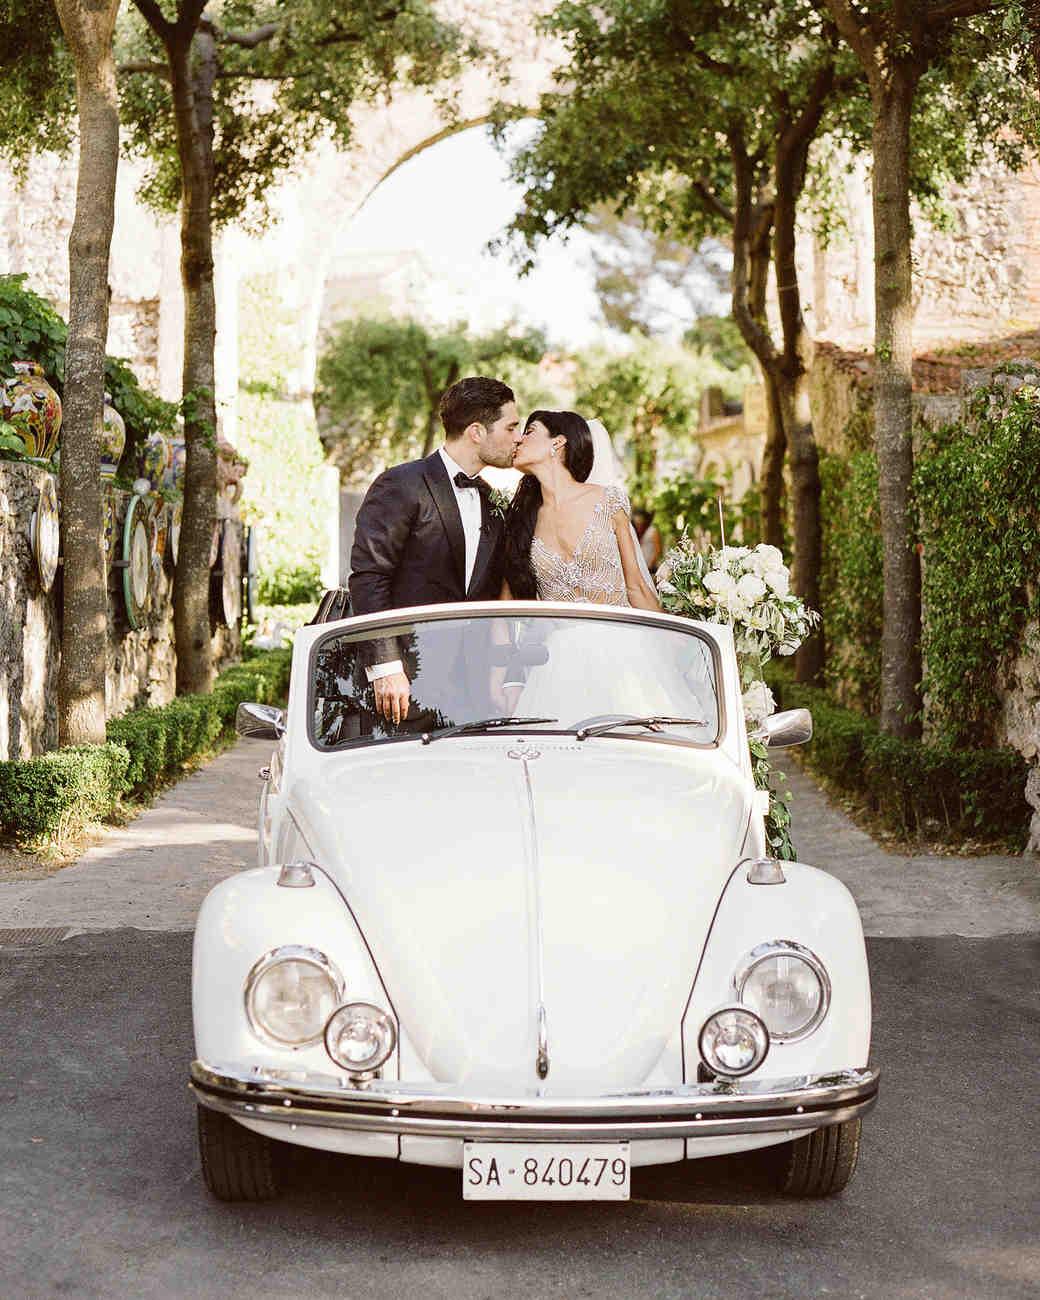 lisa greg italy wedding car convertable couple kiss